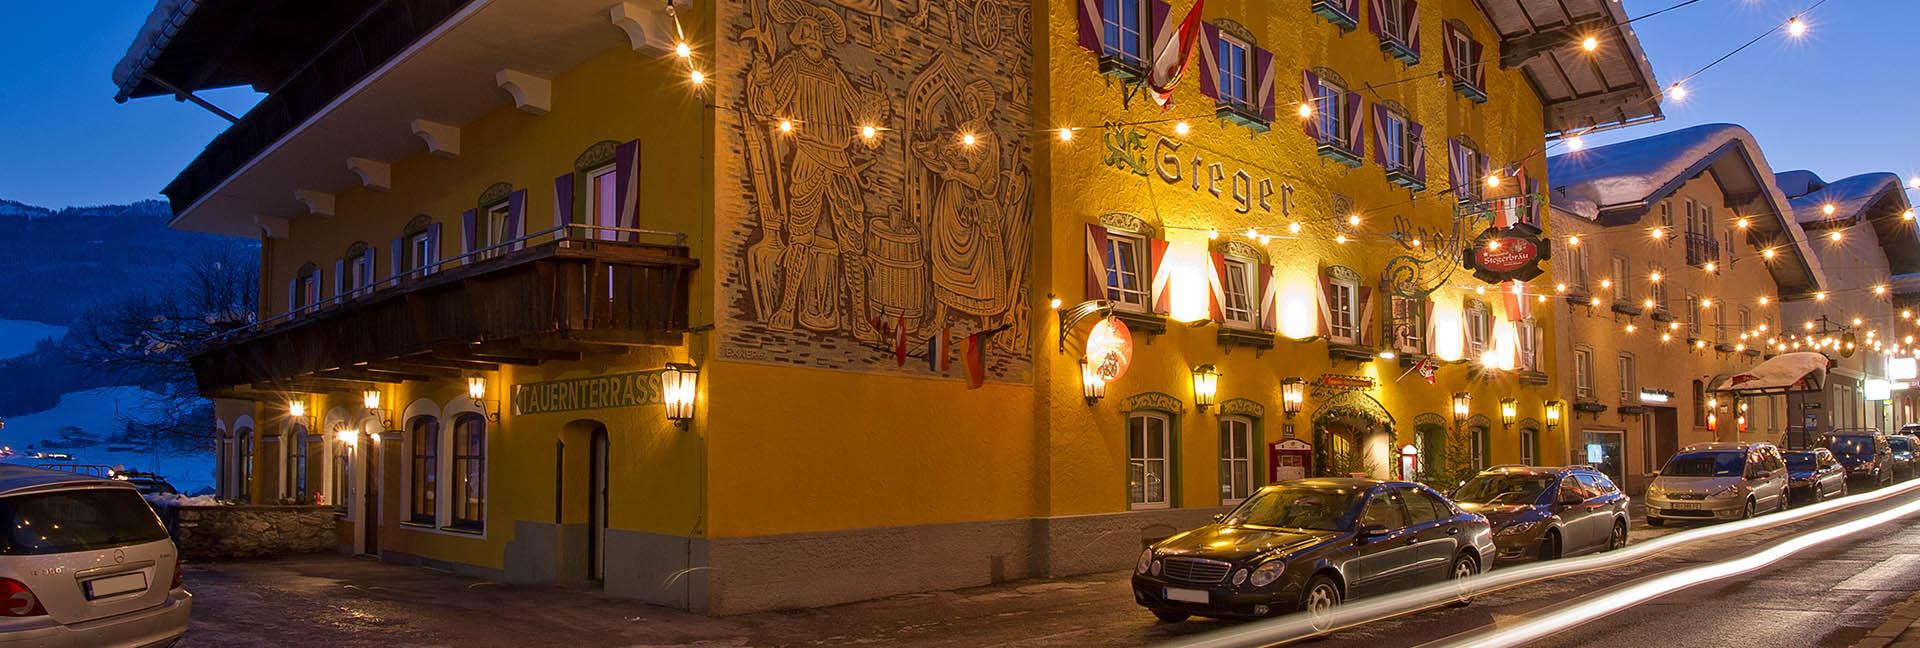 3 Sterne Hotel in Radstadt - Stegerbräu